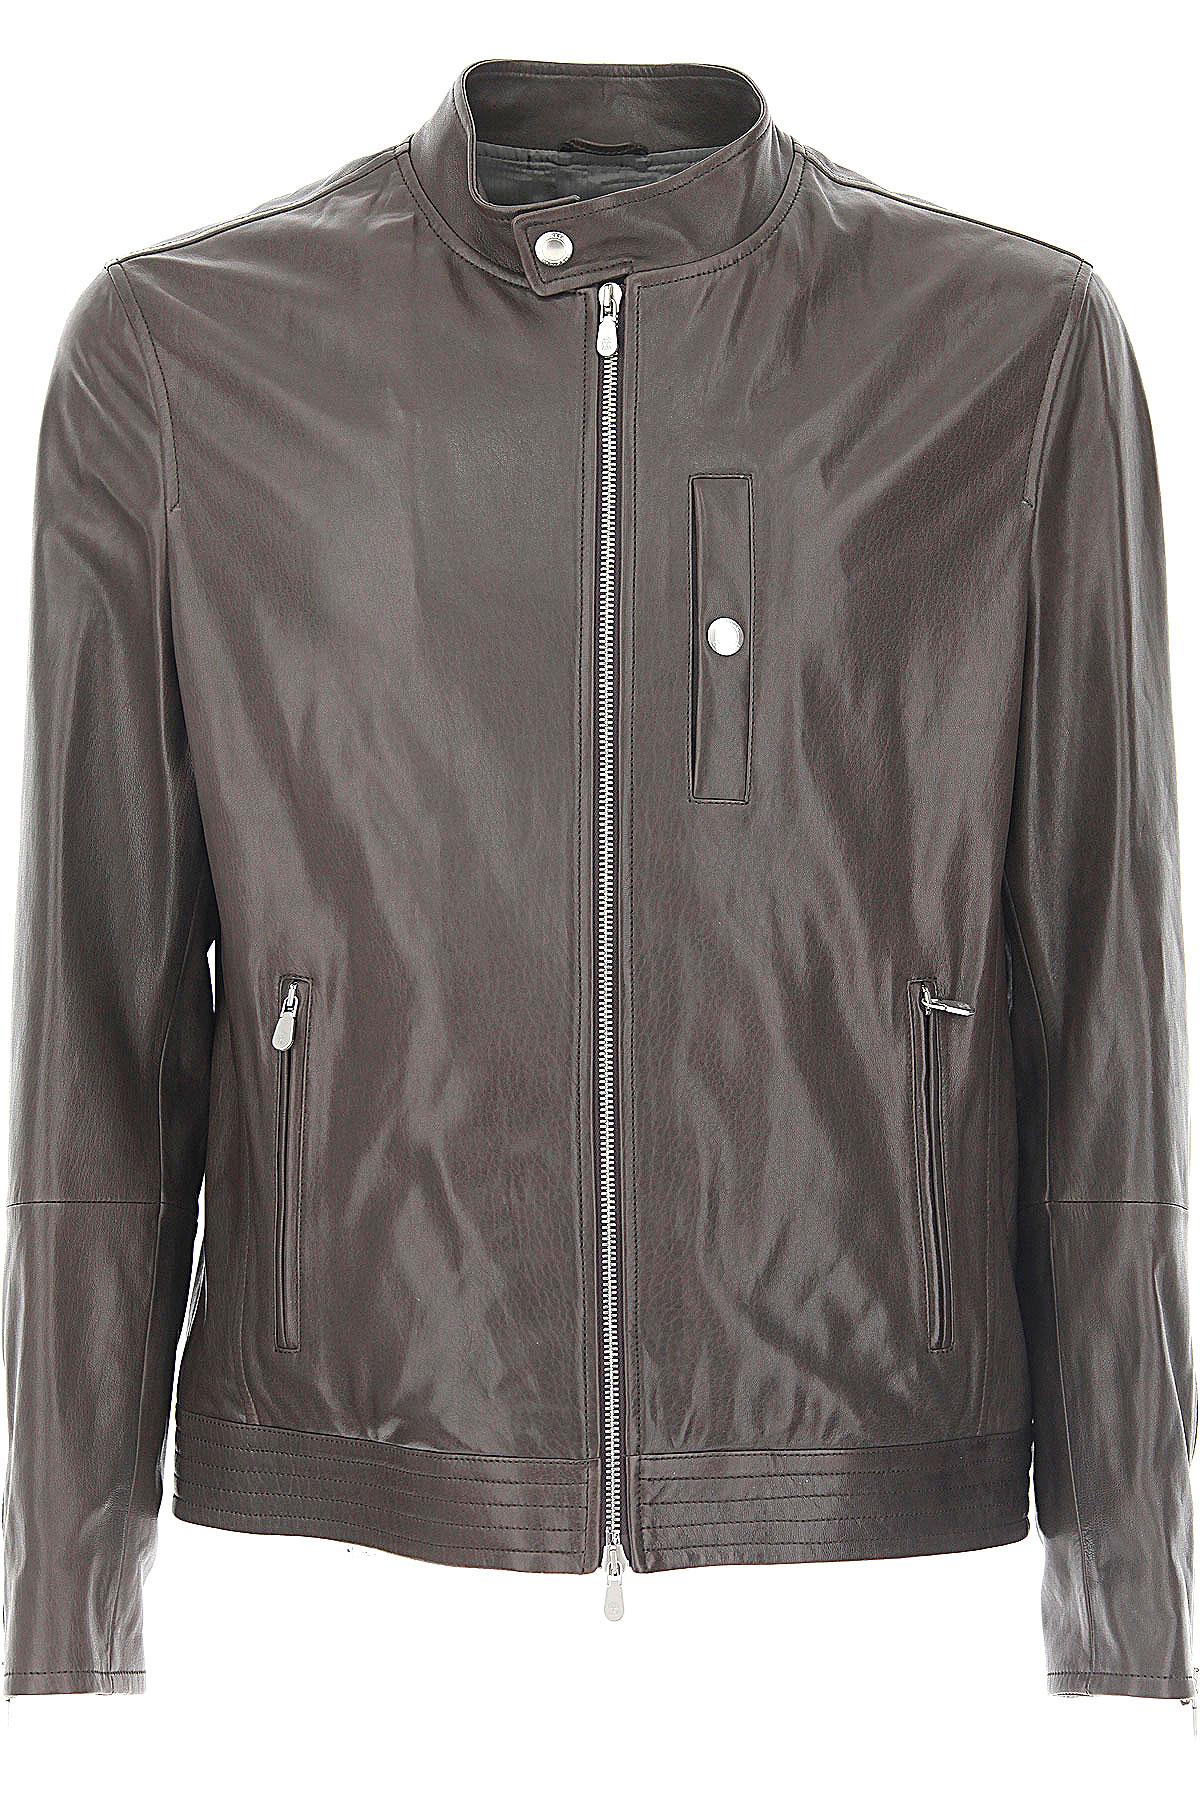 Image of Brunello Cucinelli Leather Jacket for Men On Sale, Ebony, Leather, 2017, M XL